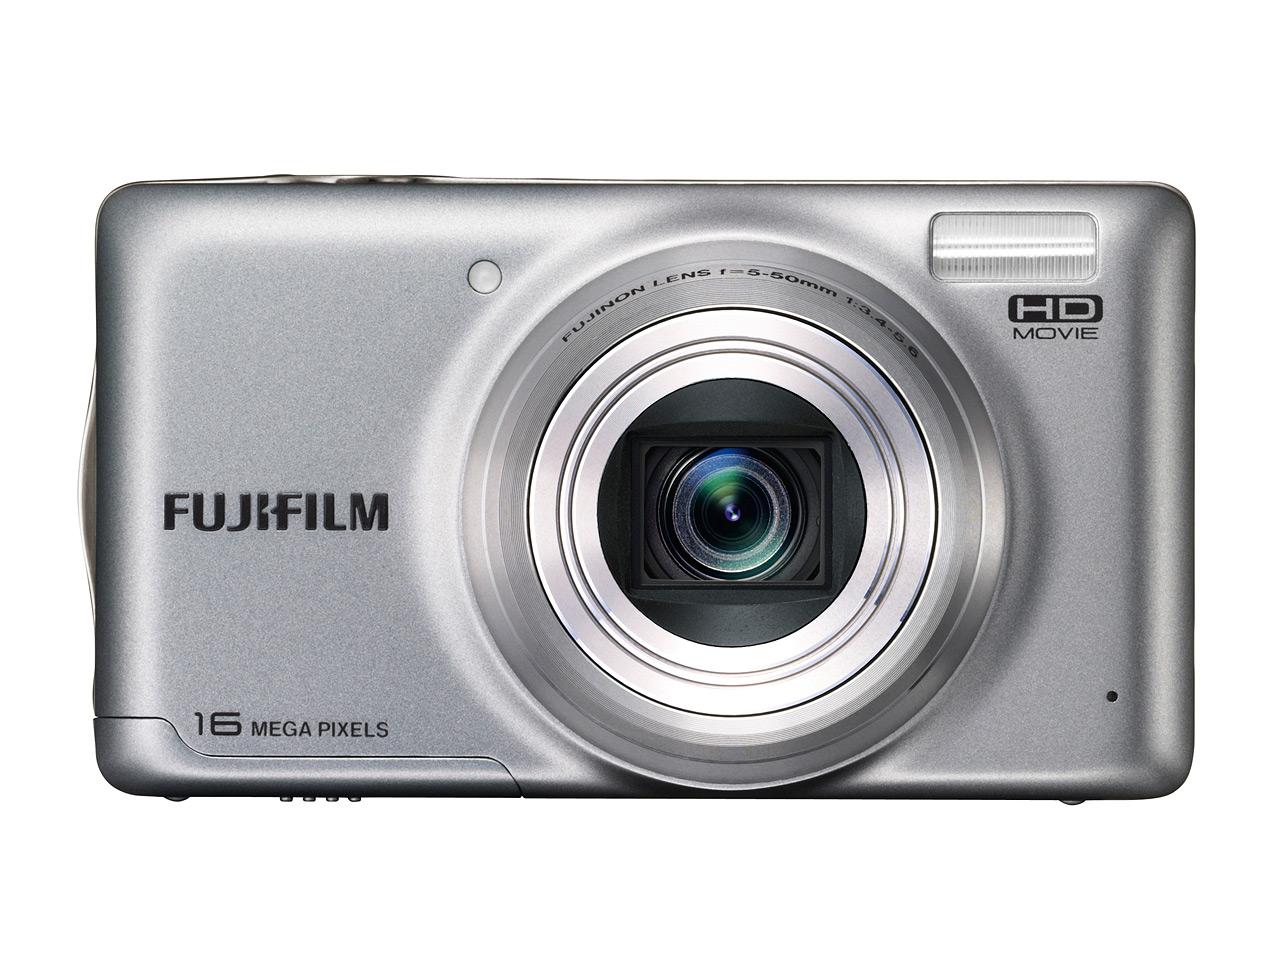 Fujifilm FinePix T400 Digital Camera Memory Card 2 x 32GB Secure Digital High Capacity 2 Pack Memory Cards SDHC